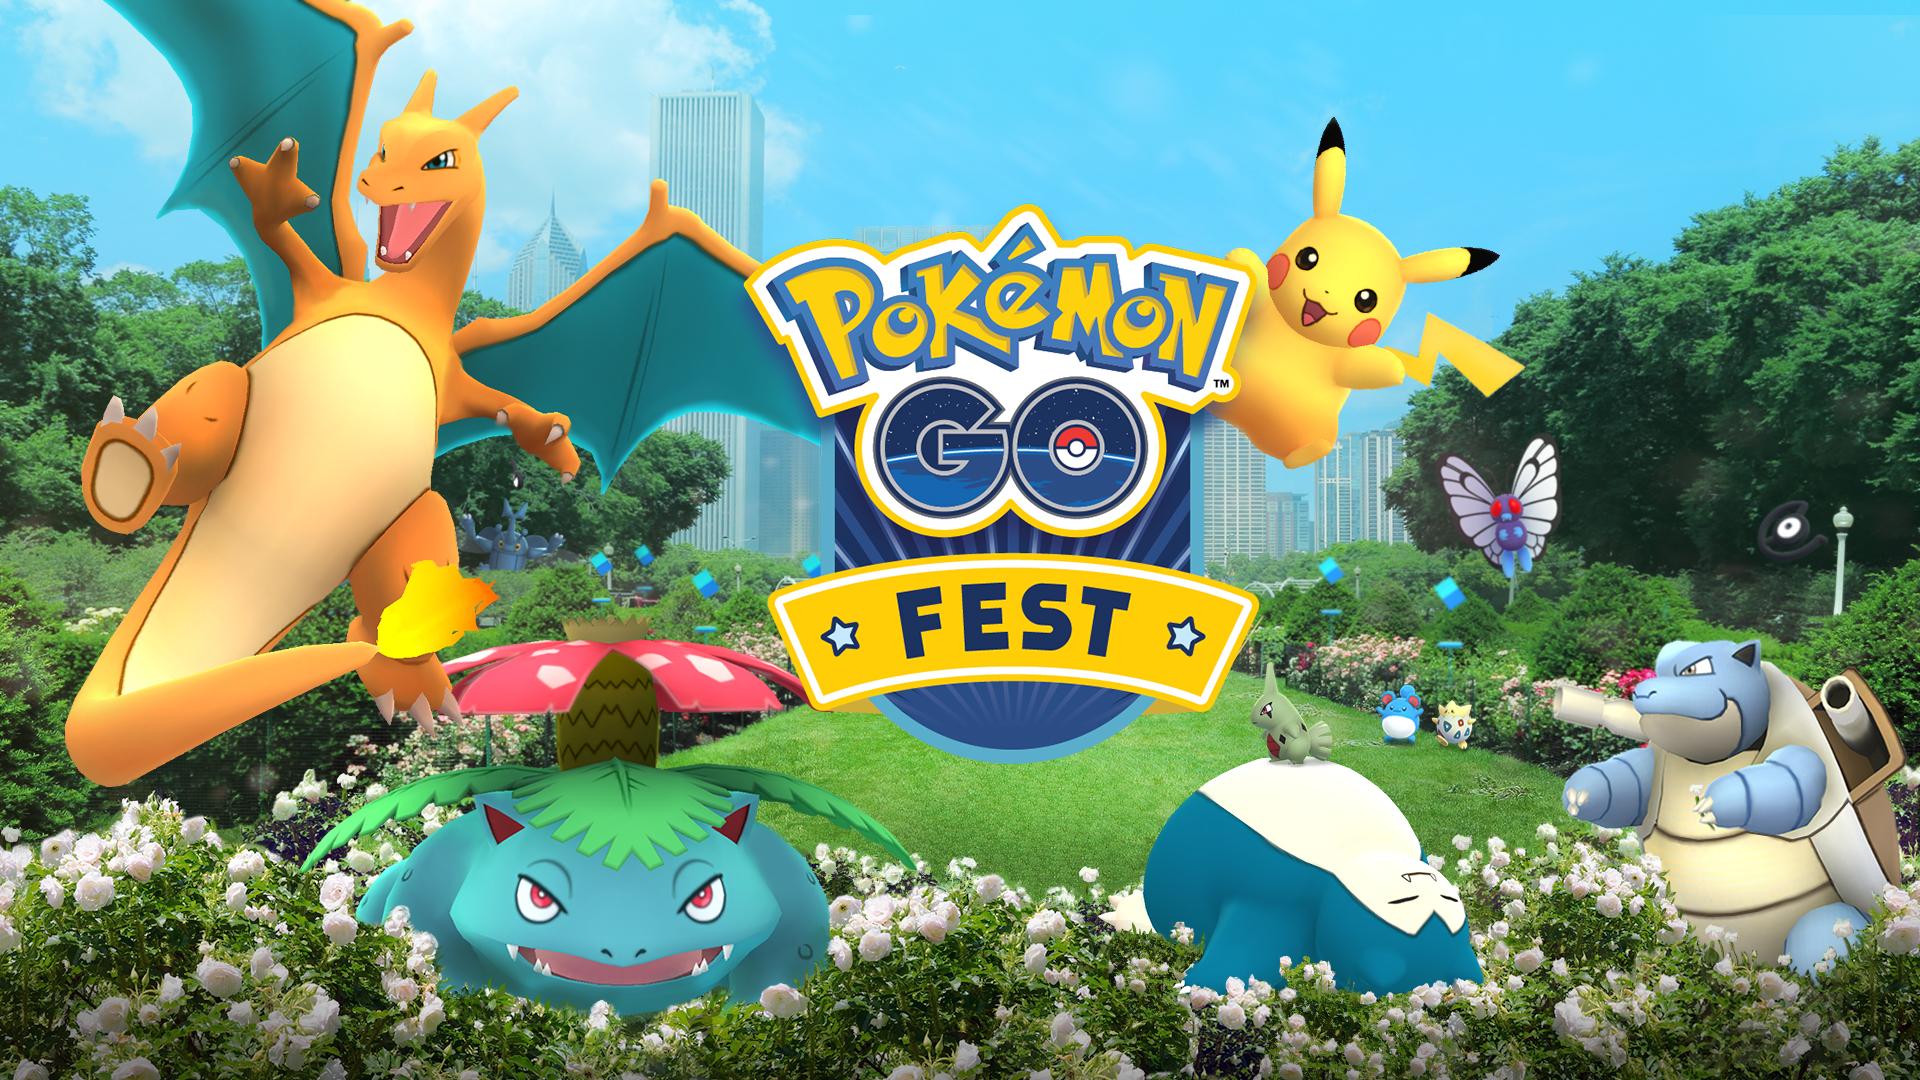 Permalink to ¡Los Pokémon legendarios llegan a Pokémon GO!